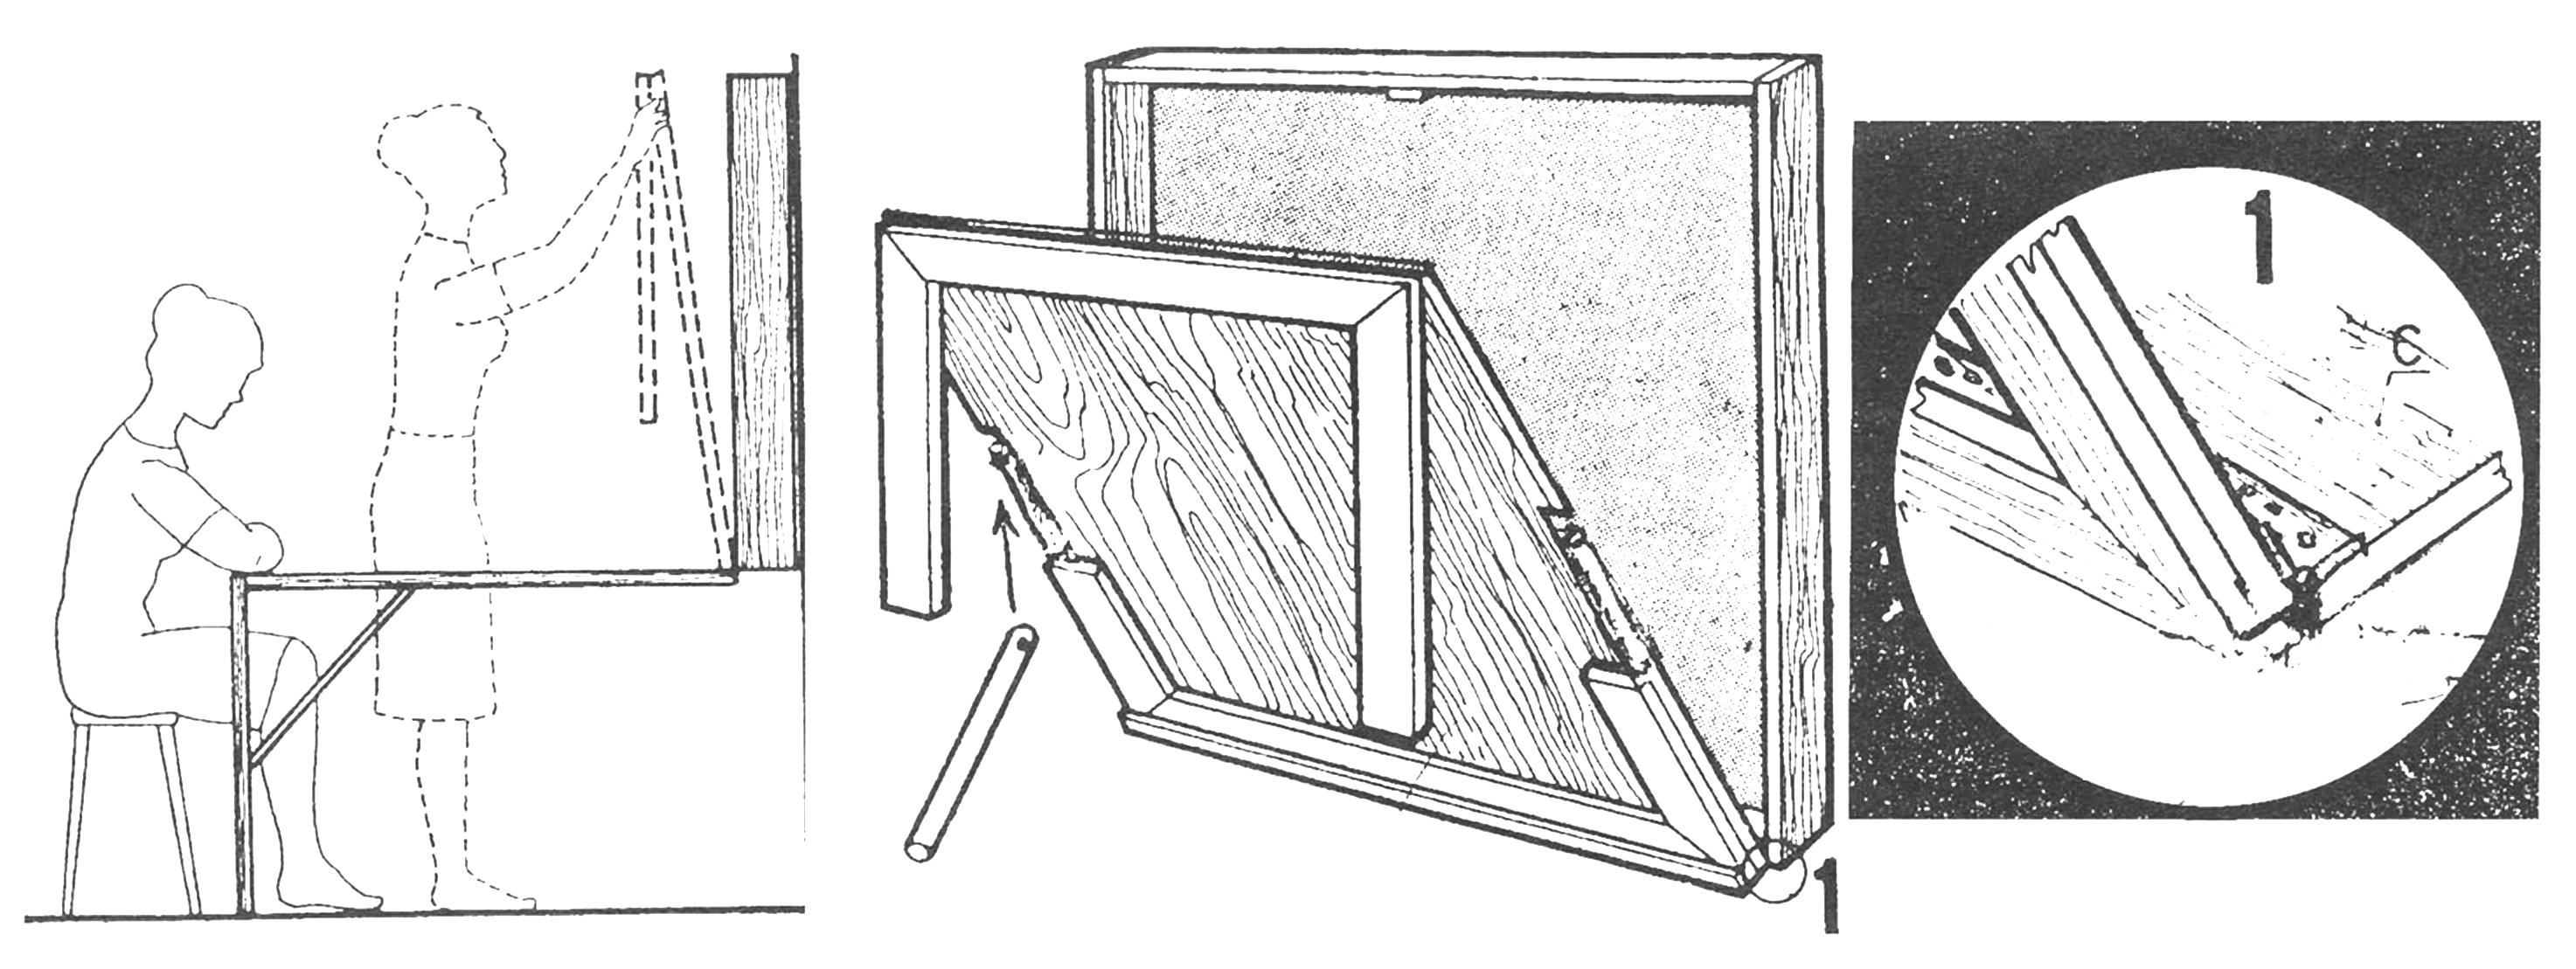 Рис. 1. Складывающийся стол-картинка